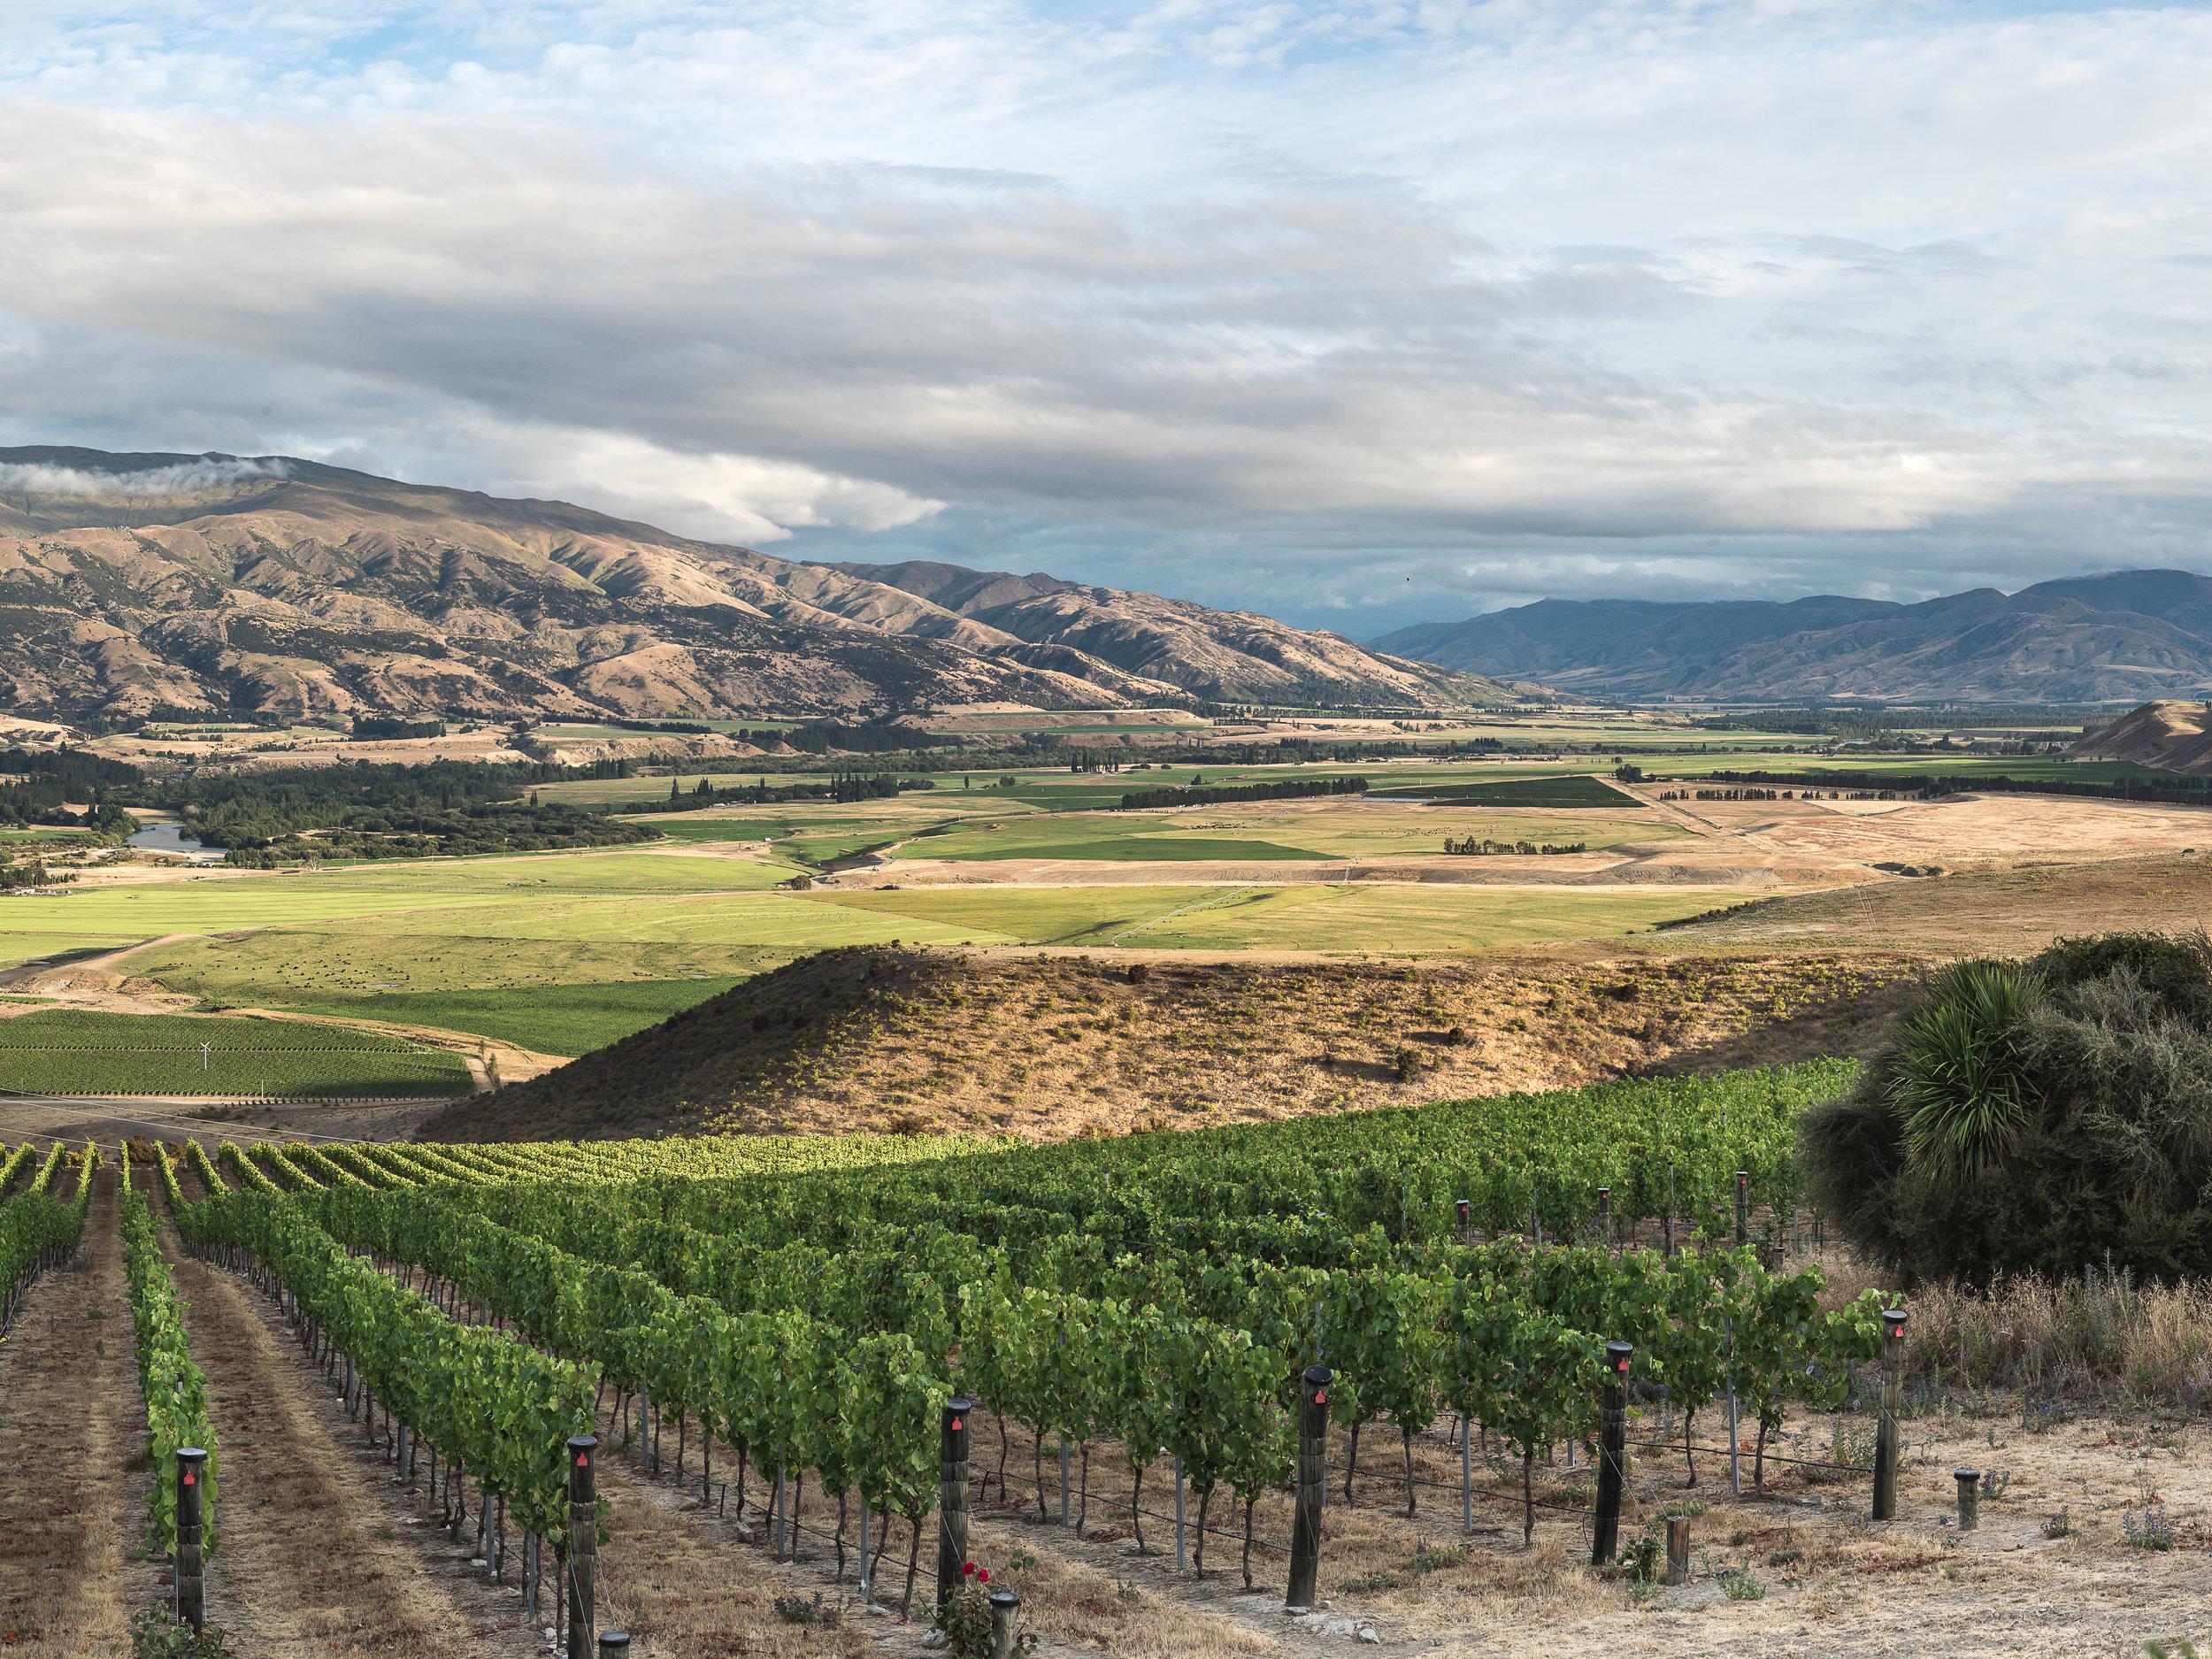 The elevated northern view from the Chinaman's Terrace vineyard, down toward Zebra's (triangular) Bendigo Flat Vineyard in the distance.